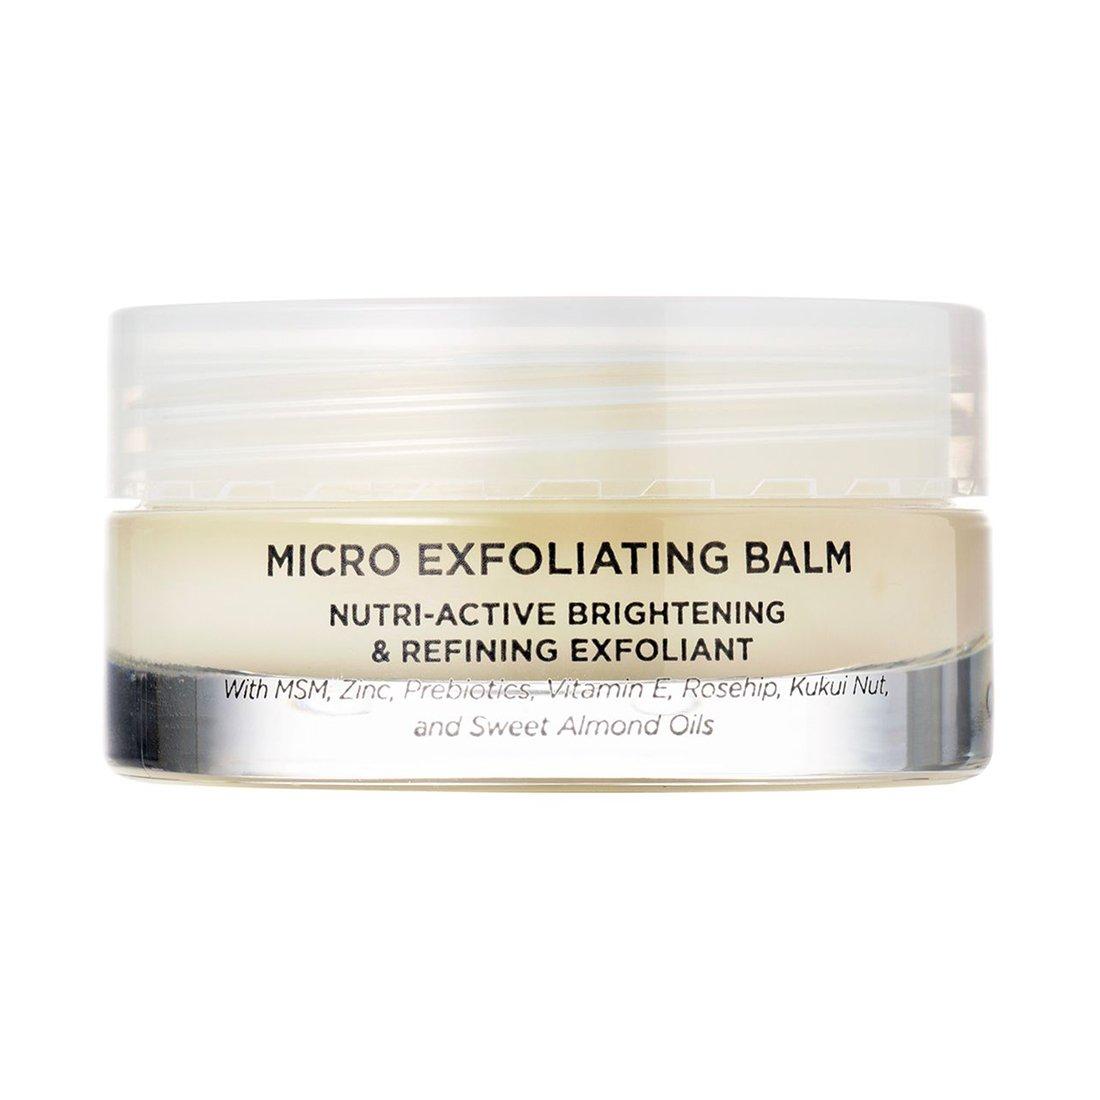 Micro Exfoliating Balm - Nutri-Active Nourishing & Refining Facial Polish (50ml). Winner of 4 awards, including Best Facial Scrub - Tatler Beauty Awards 2012. by Oskia